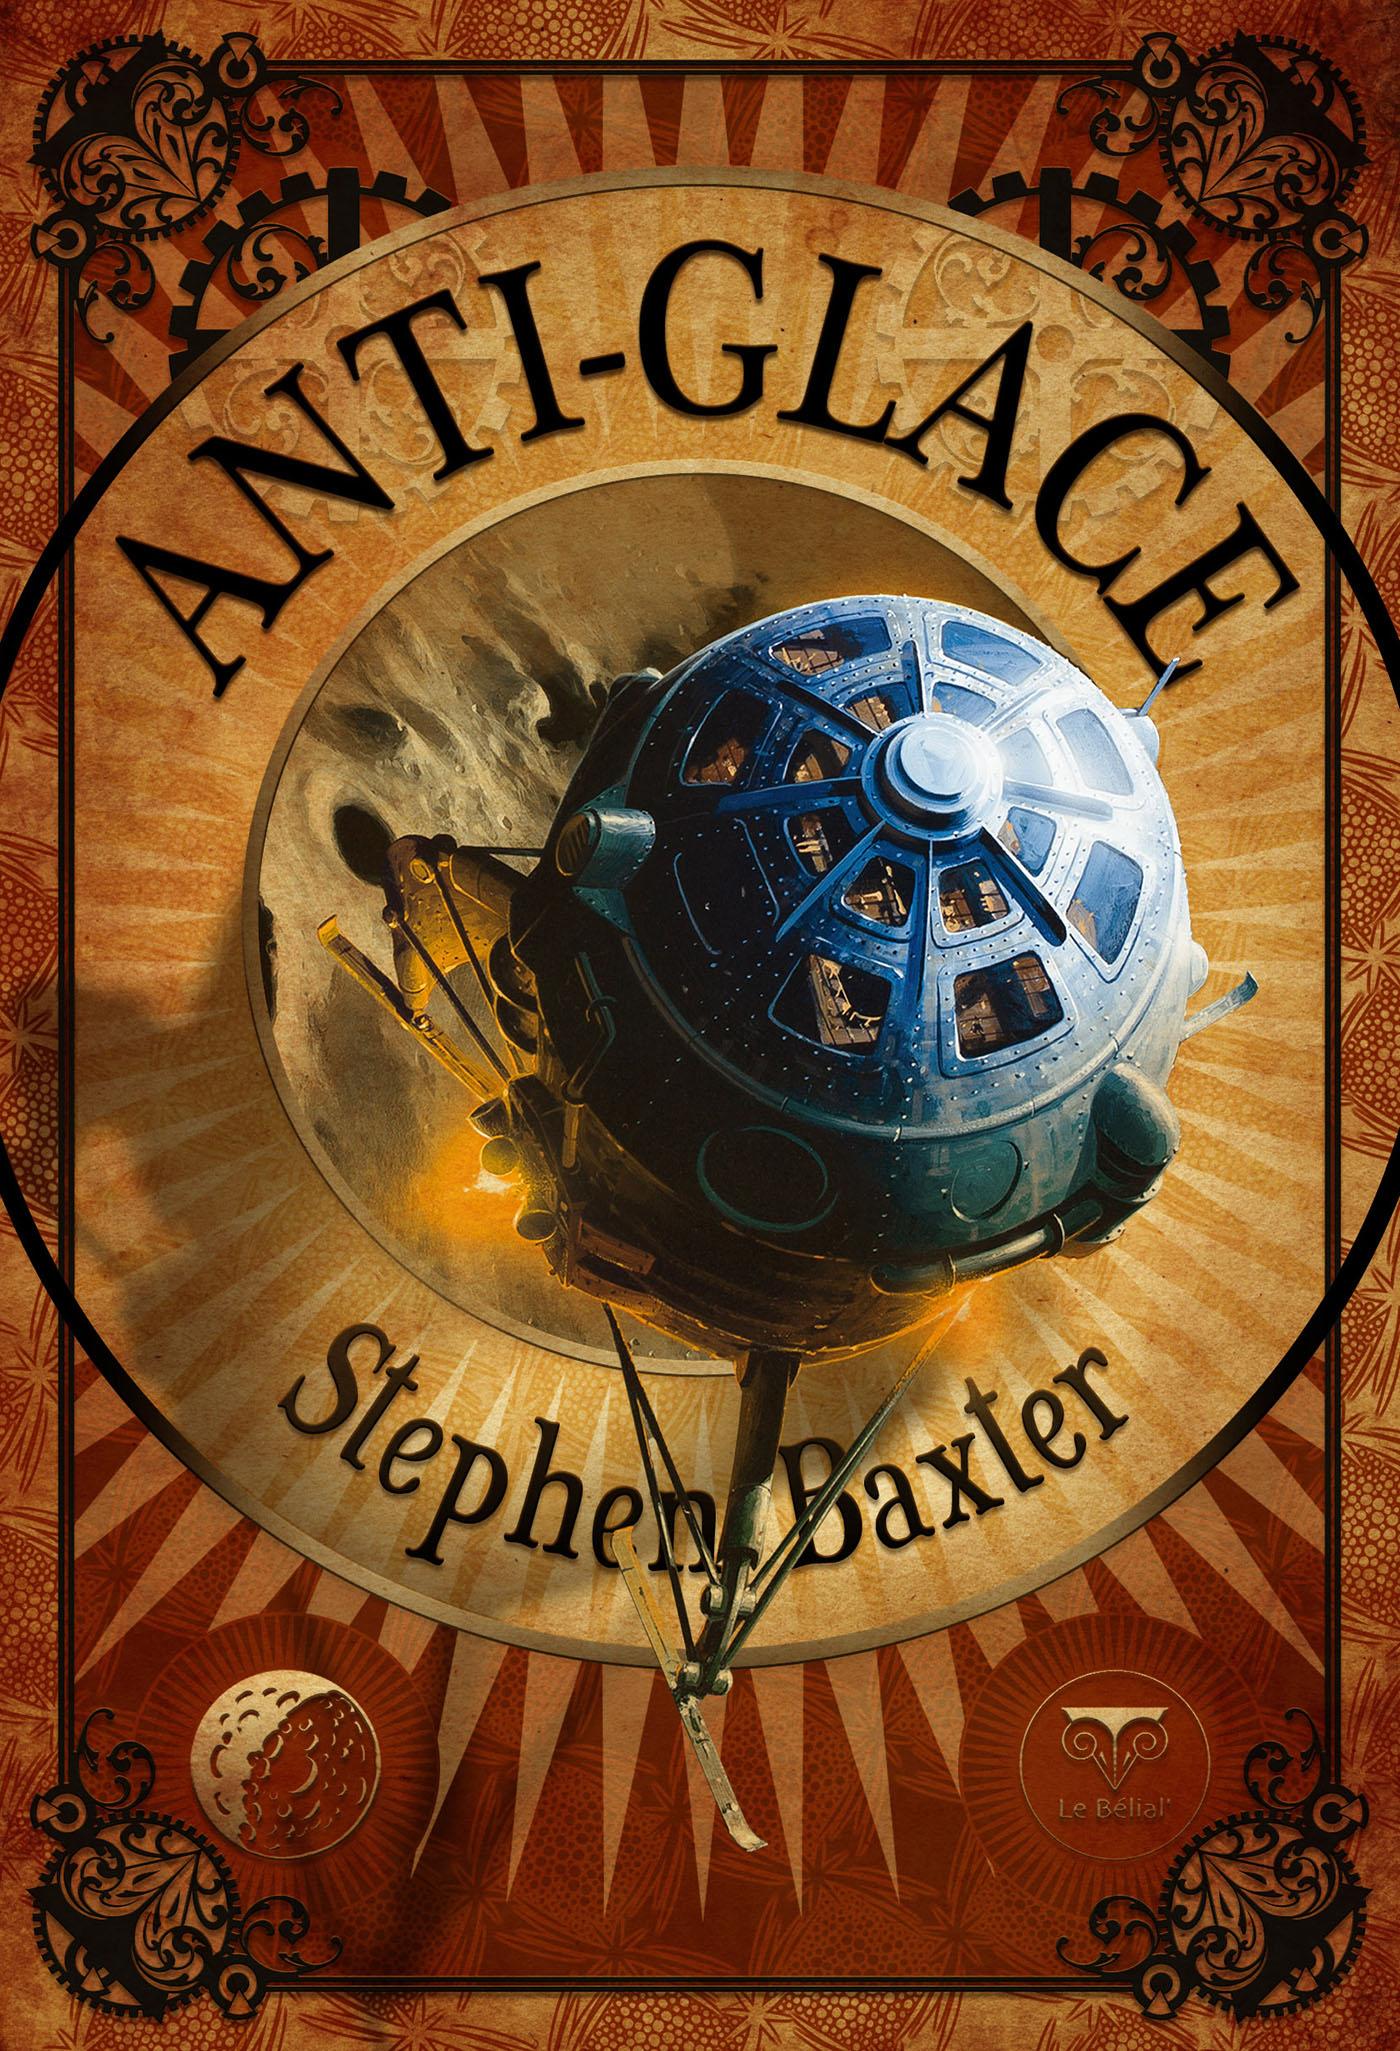 Stephen Baxter - Antiglace